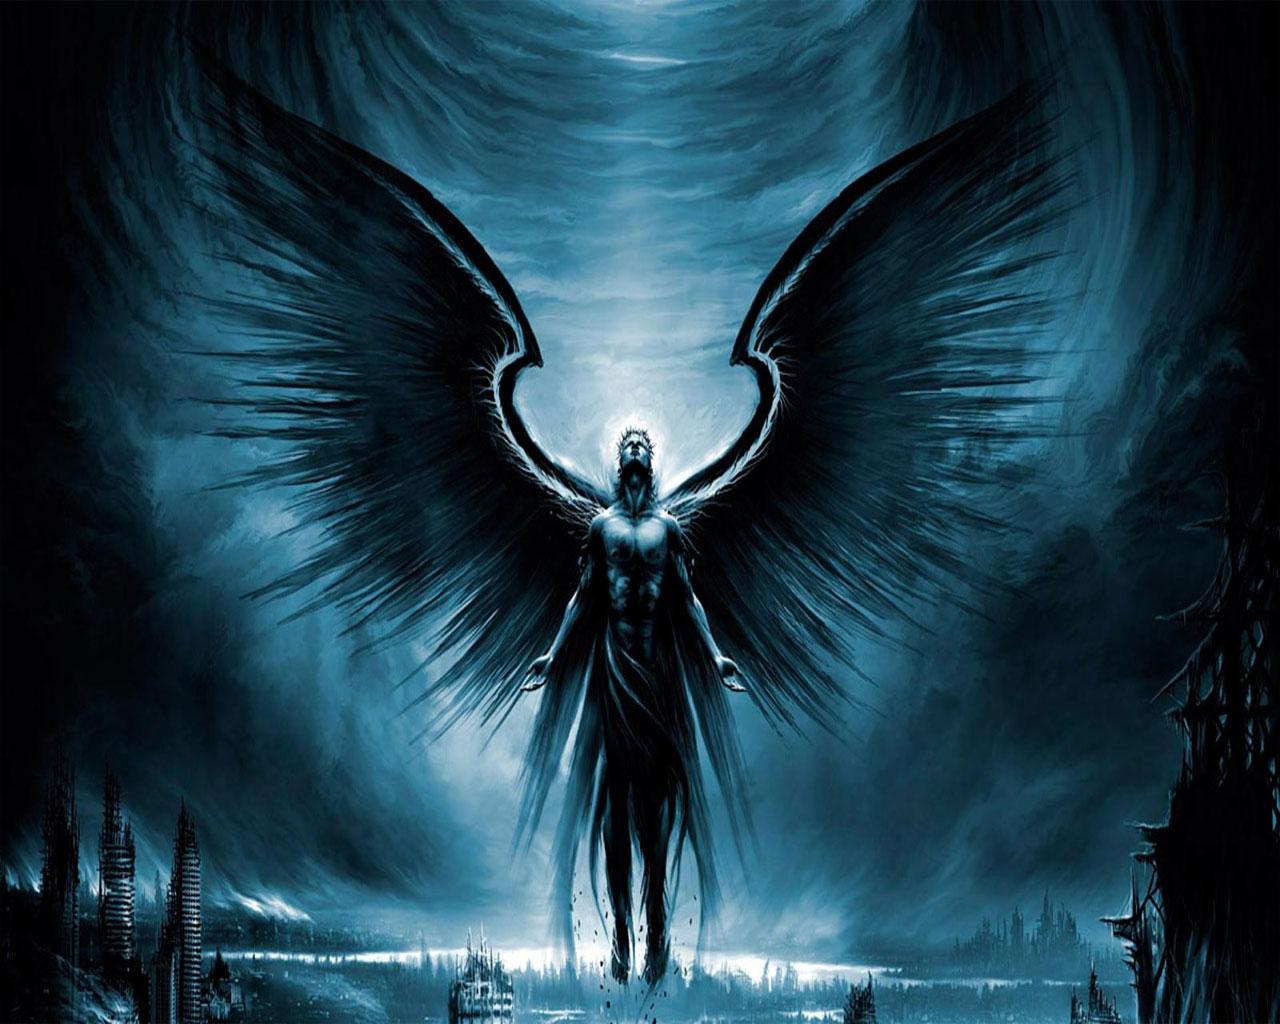 Ya novelties review sweet evil by wendy higgins - Dark gothic angel wallpaper ...